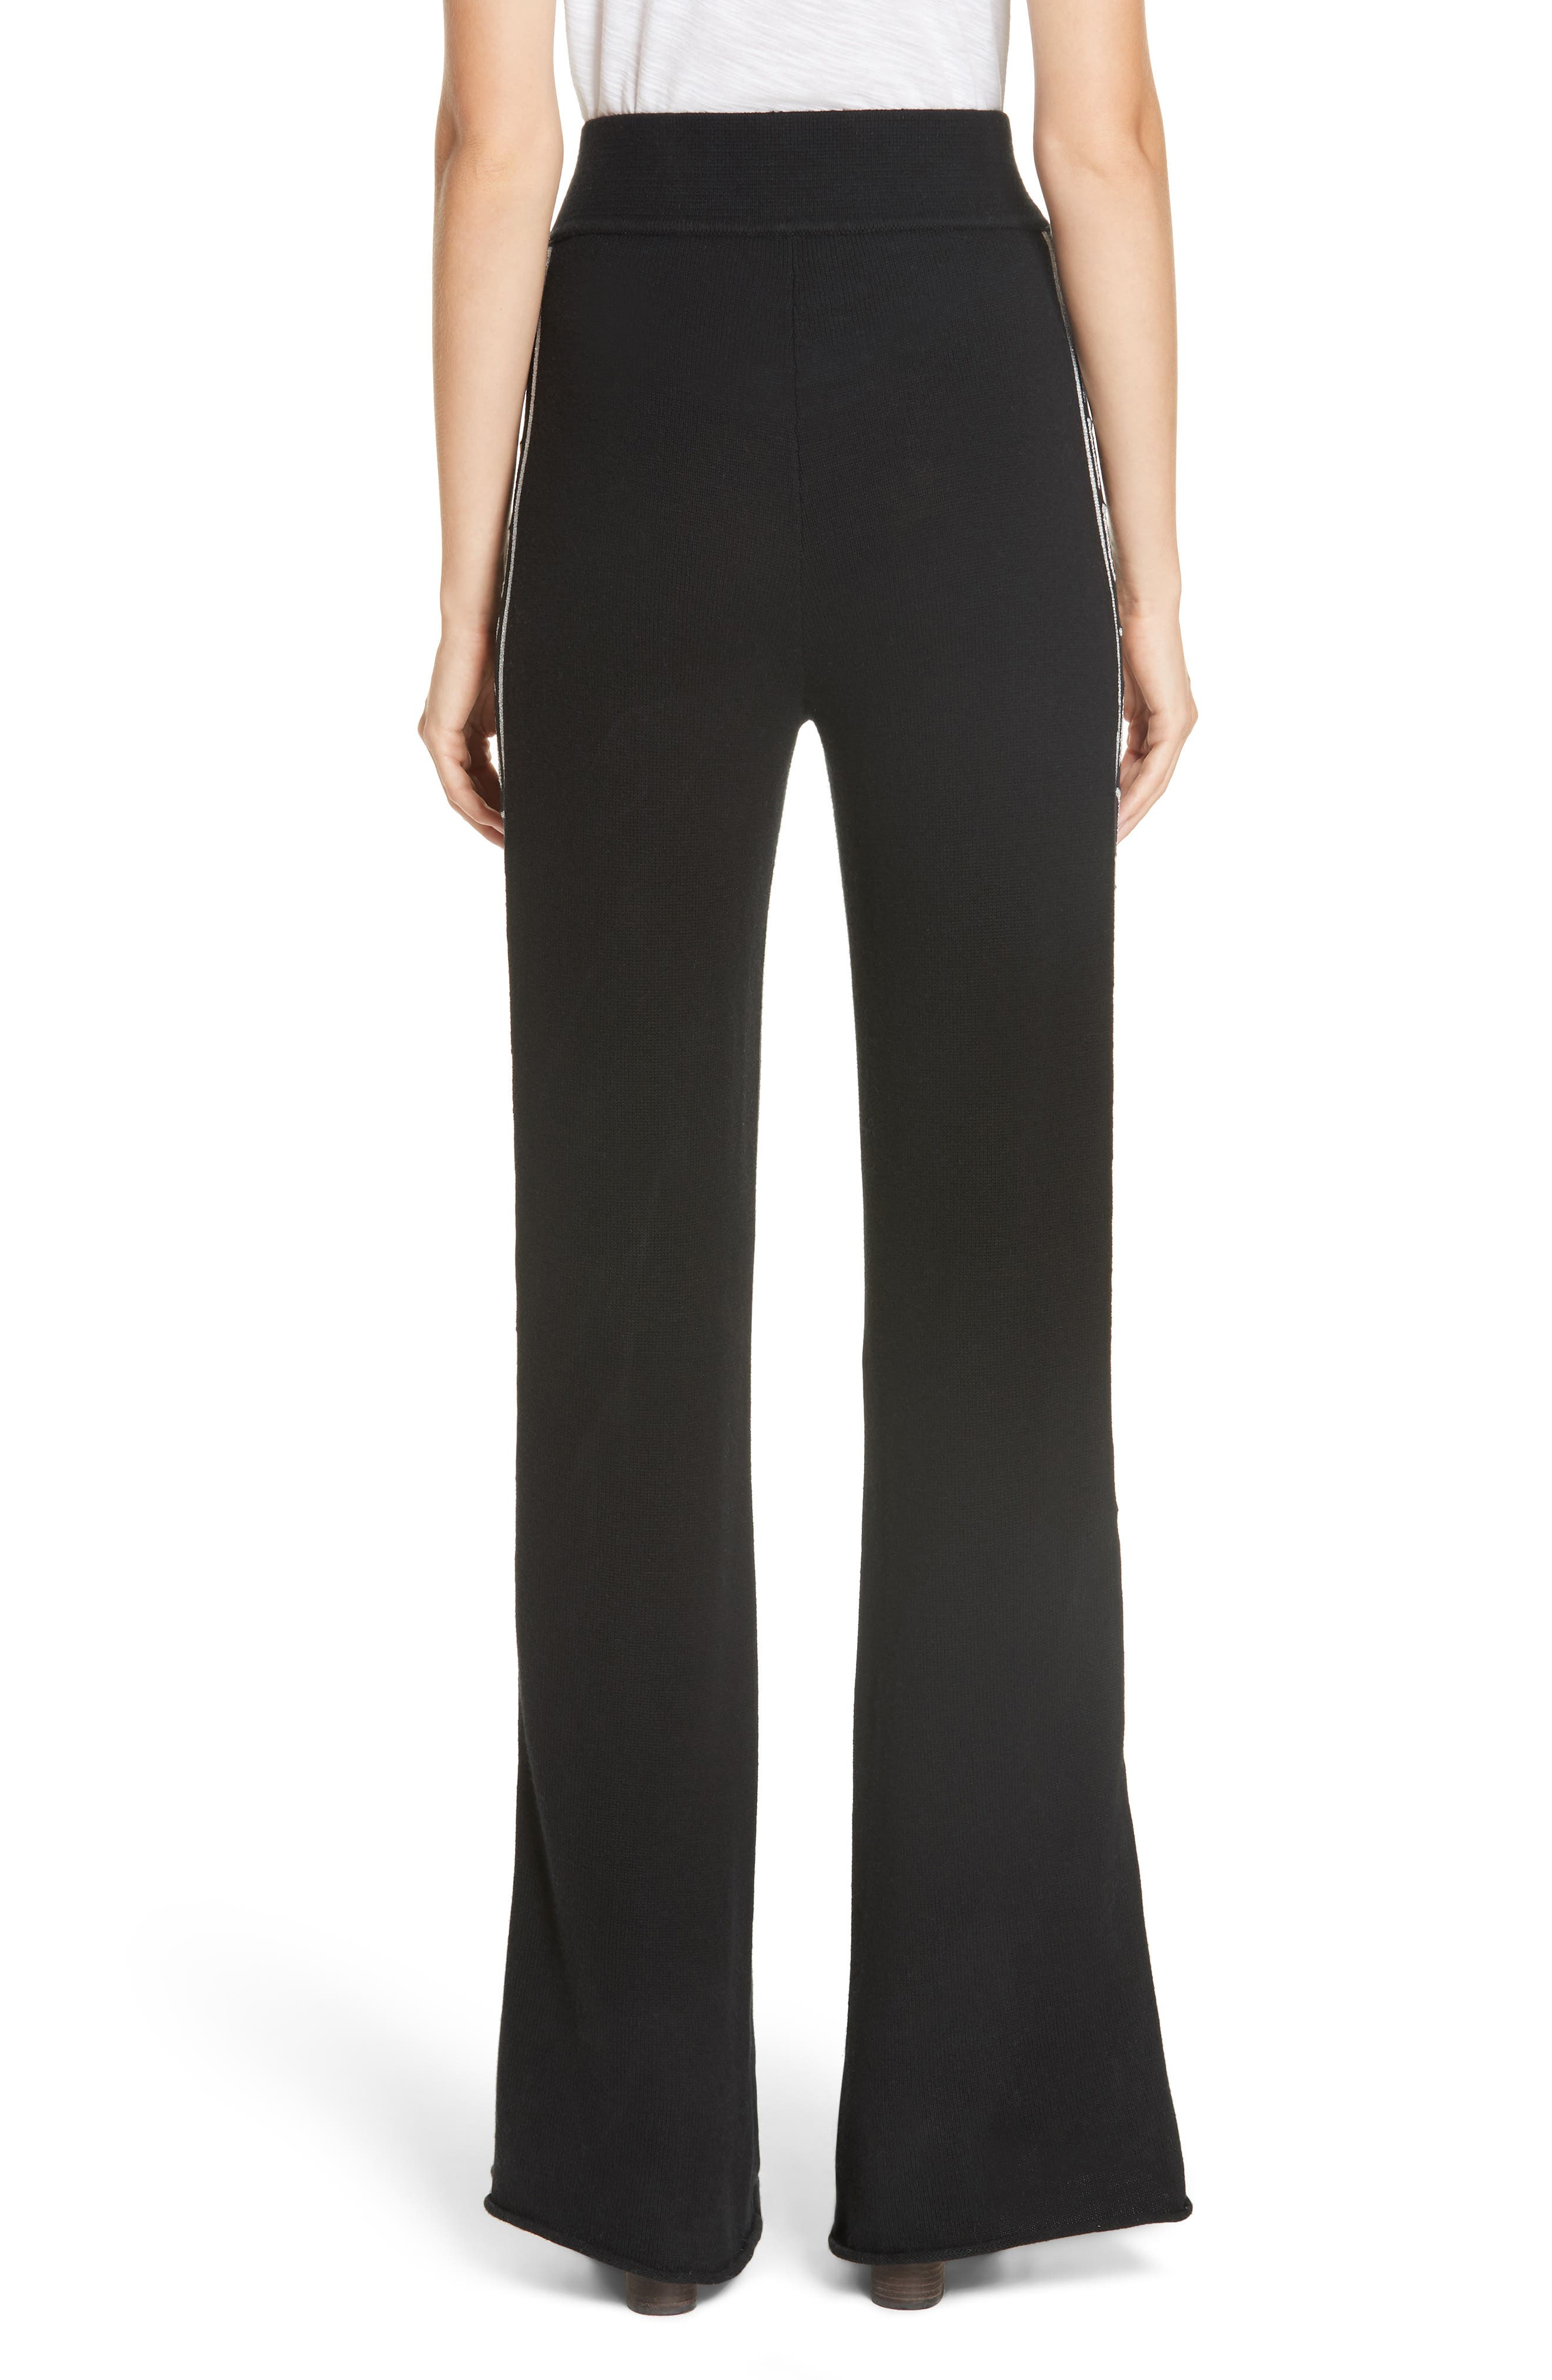 Metallic Knit Wool Blend Trousers,                             Alternate thumbnail 2, color,                             BLACK